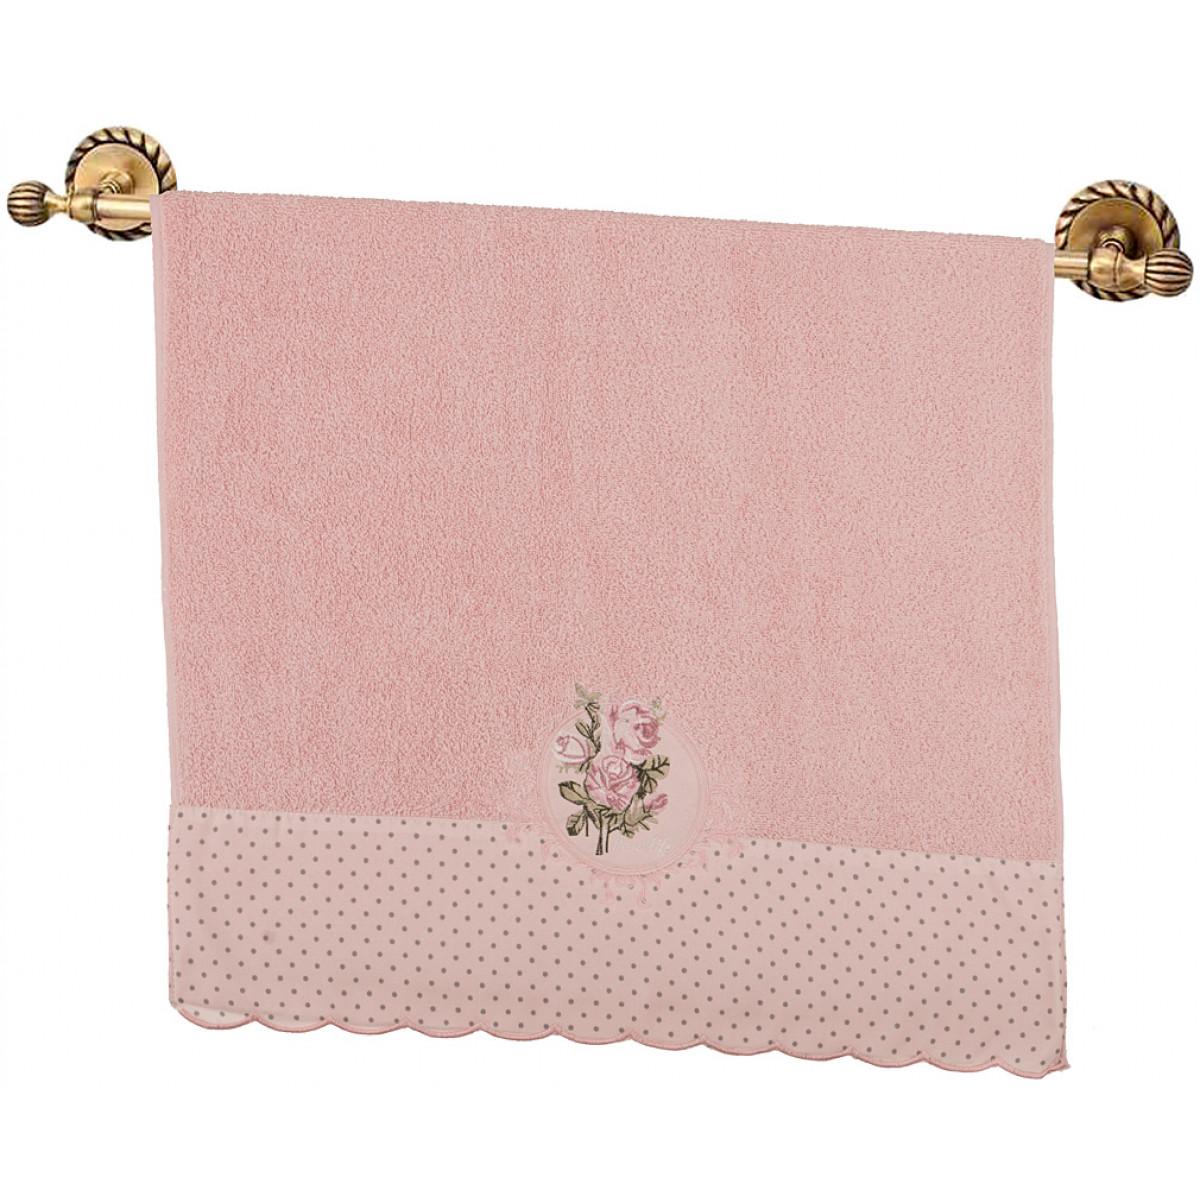 Полотенца Santalino Полотенце Bentley  (50х90 см) полотенца банные la pastel полотенце кружево 50х90 см